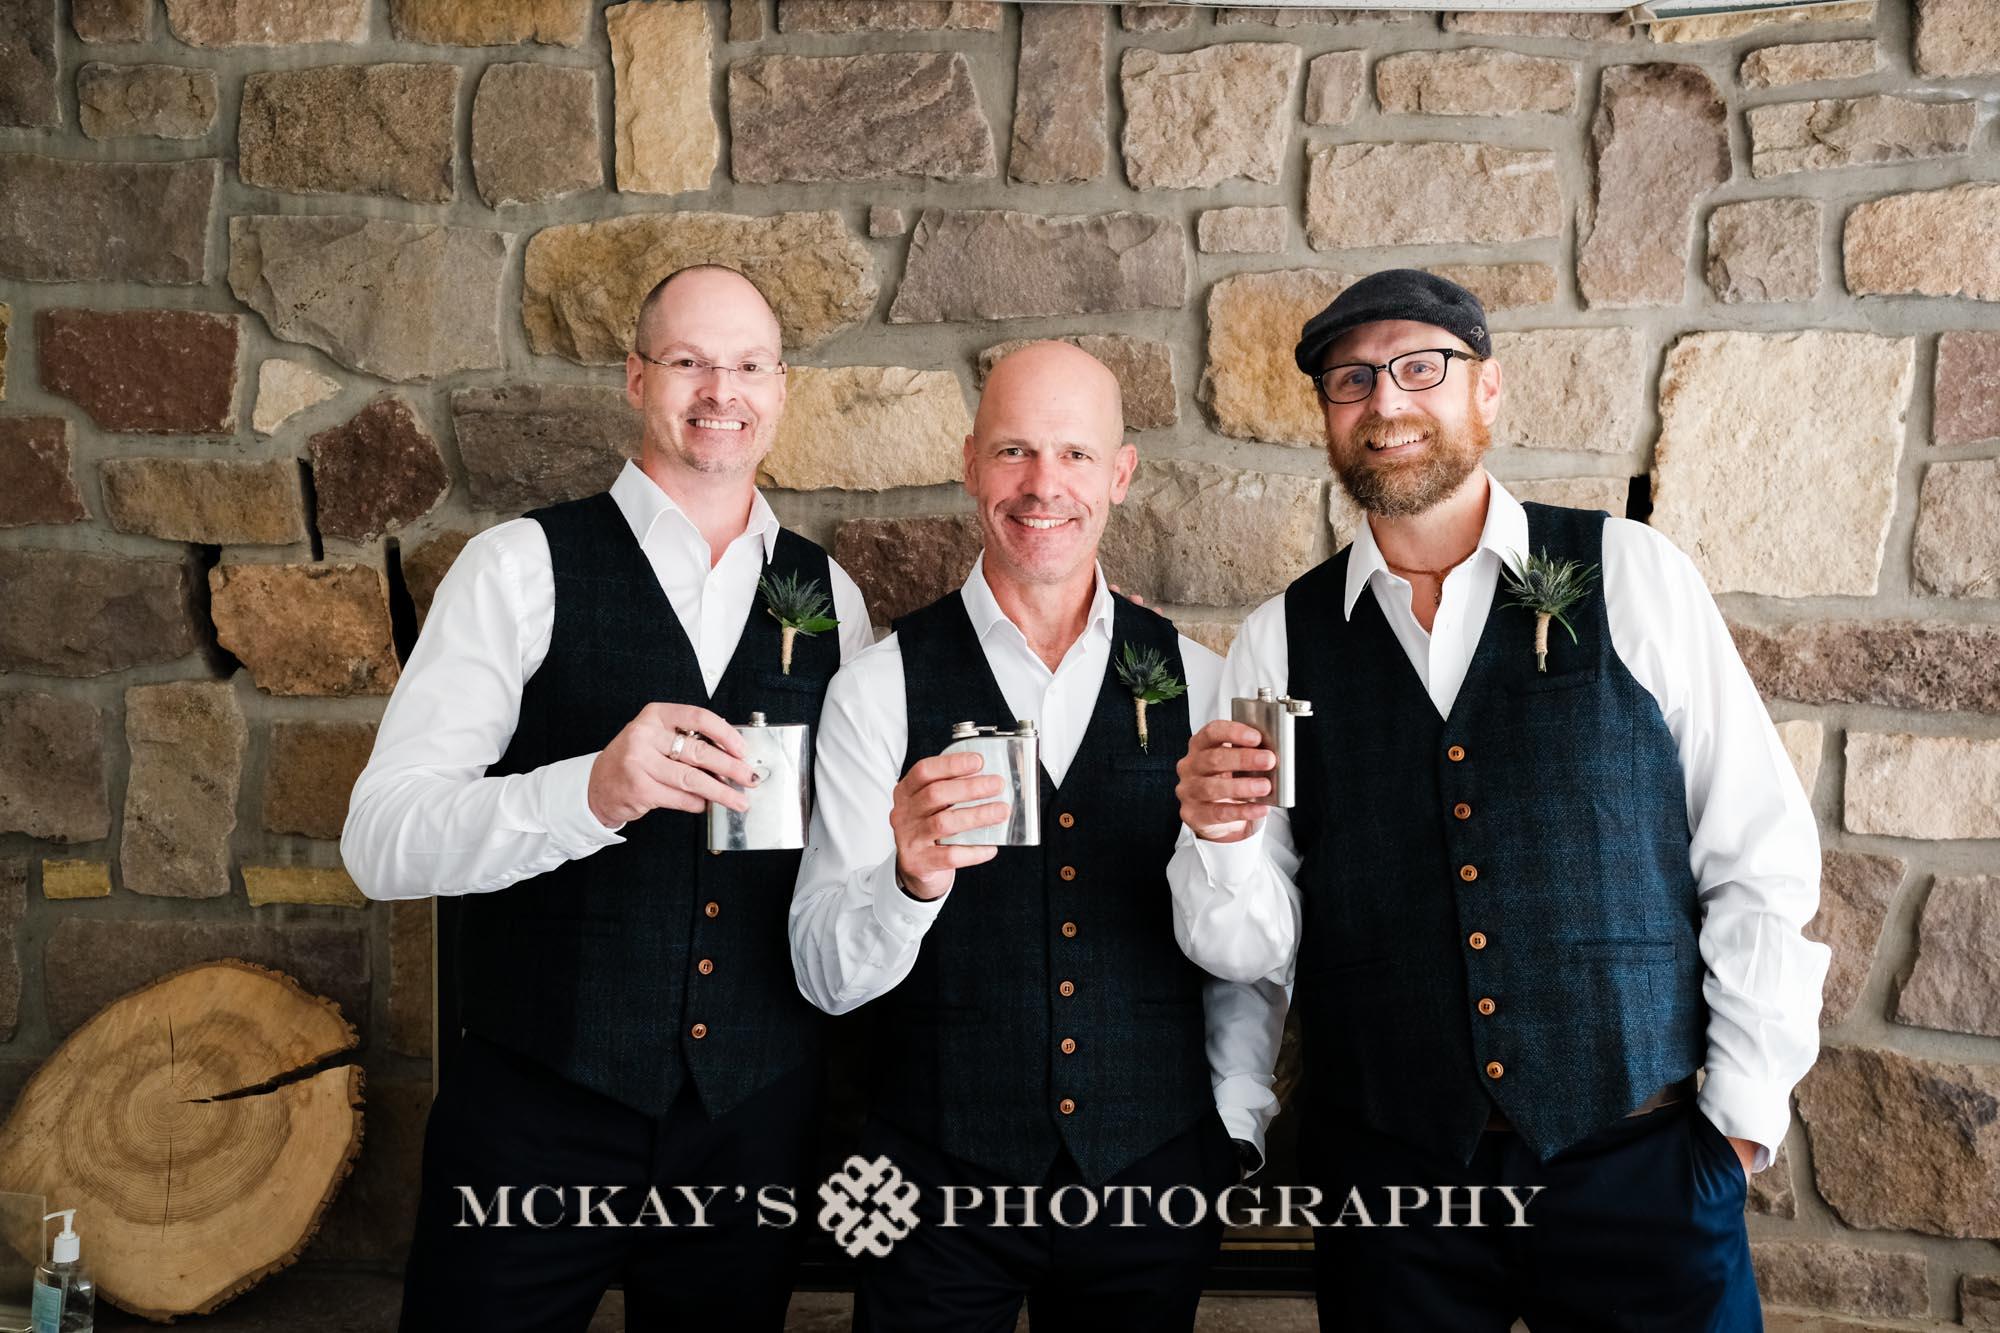 wedding photography in Finger lakes NY